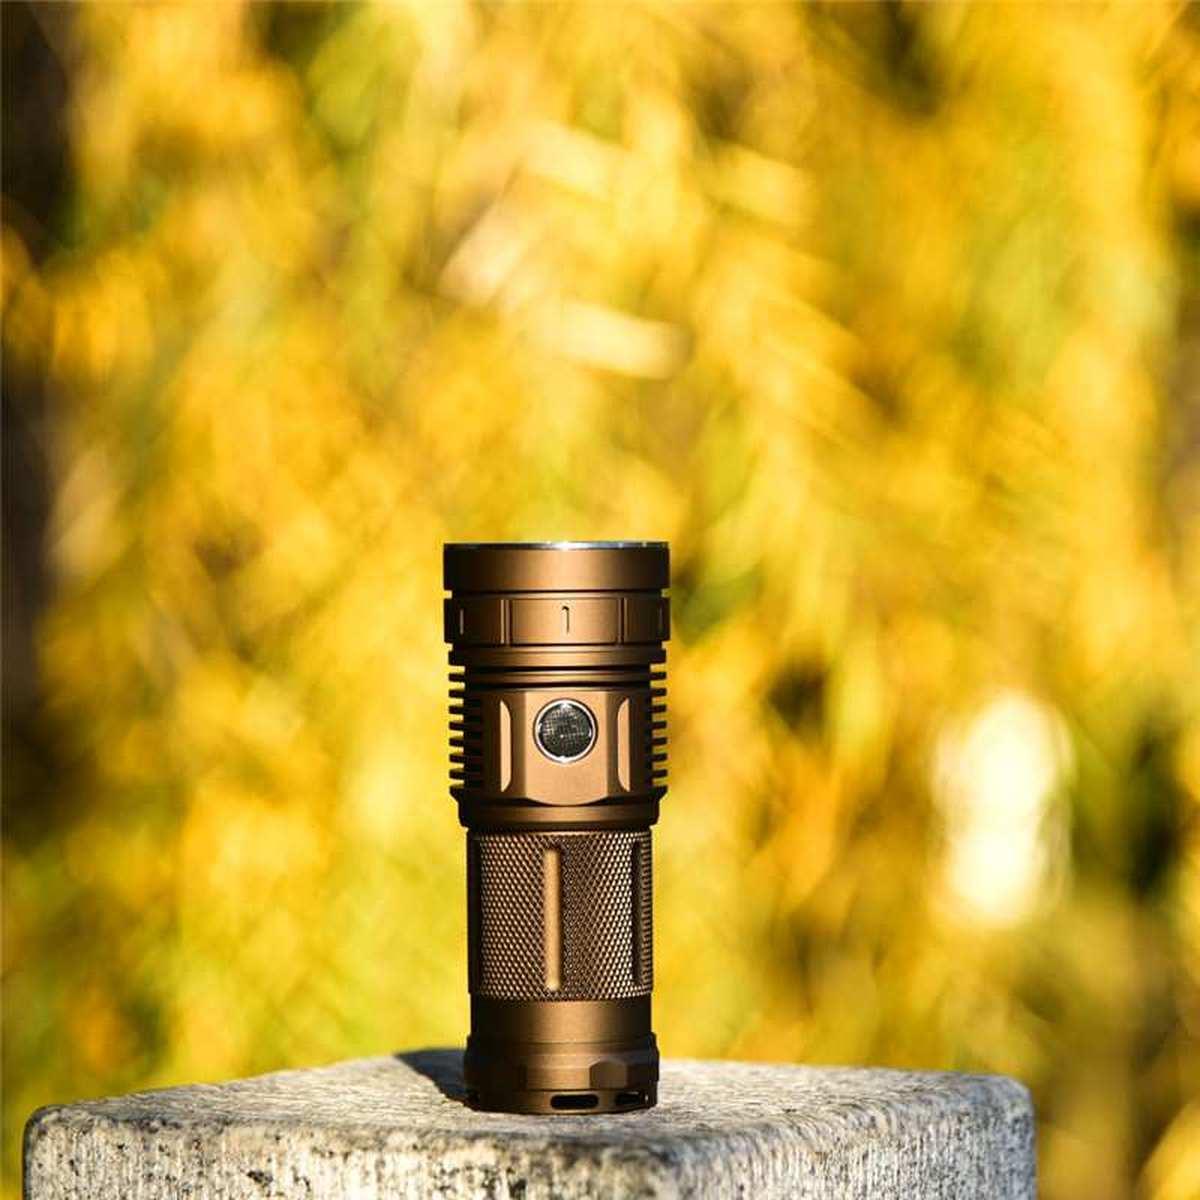 Haikelite HK04 Flashlight 13000LM Super Bright 4 x XHP50.2 Anduril UI IPX7 Waterproof Torch for Camping Spotlights Lantern Lamp enlarge